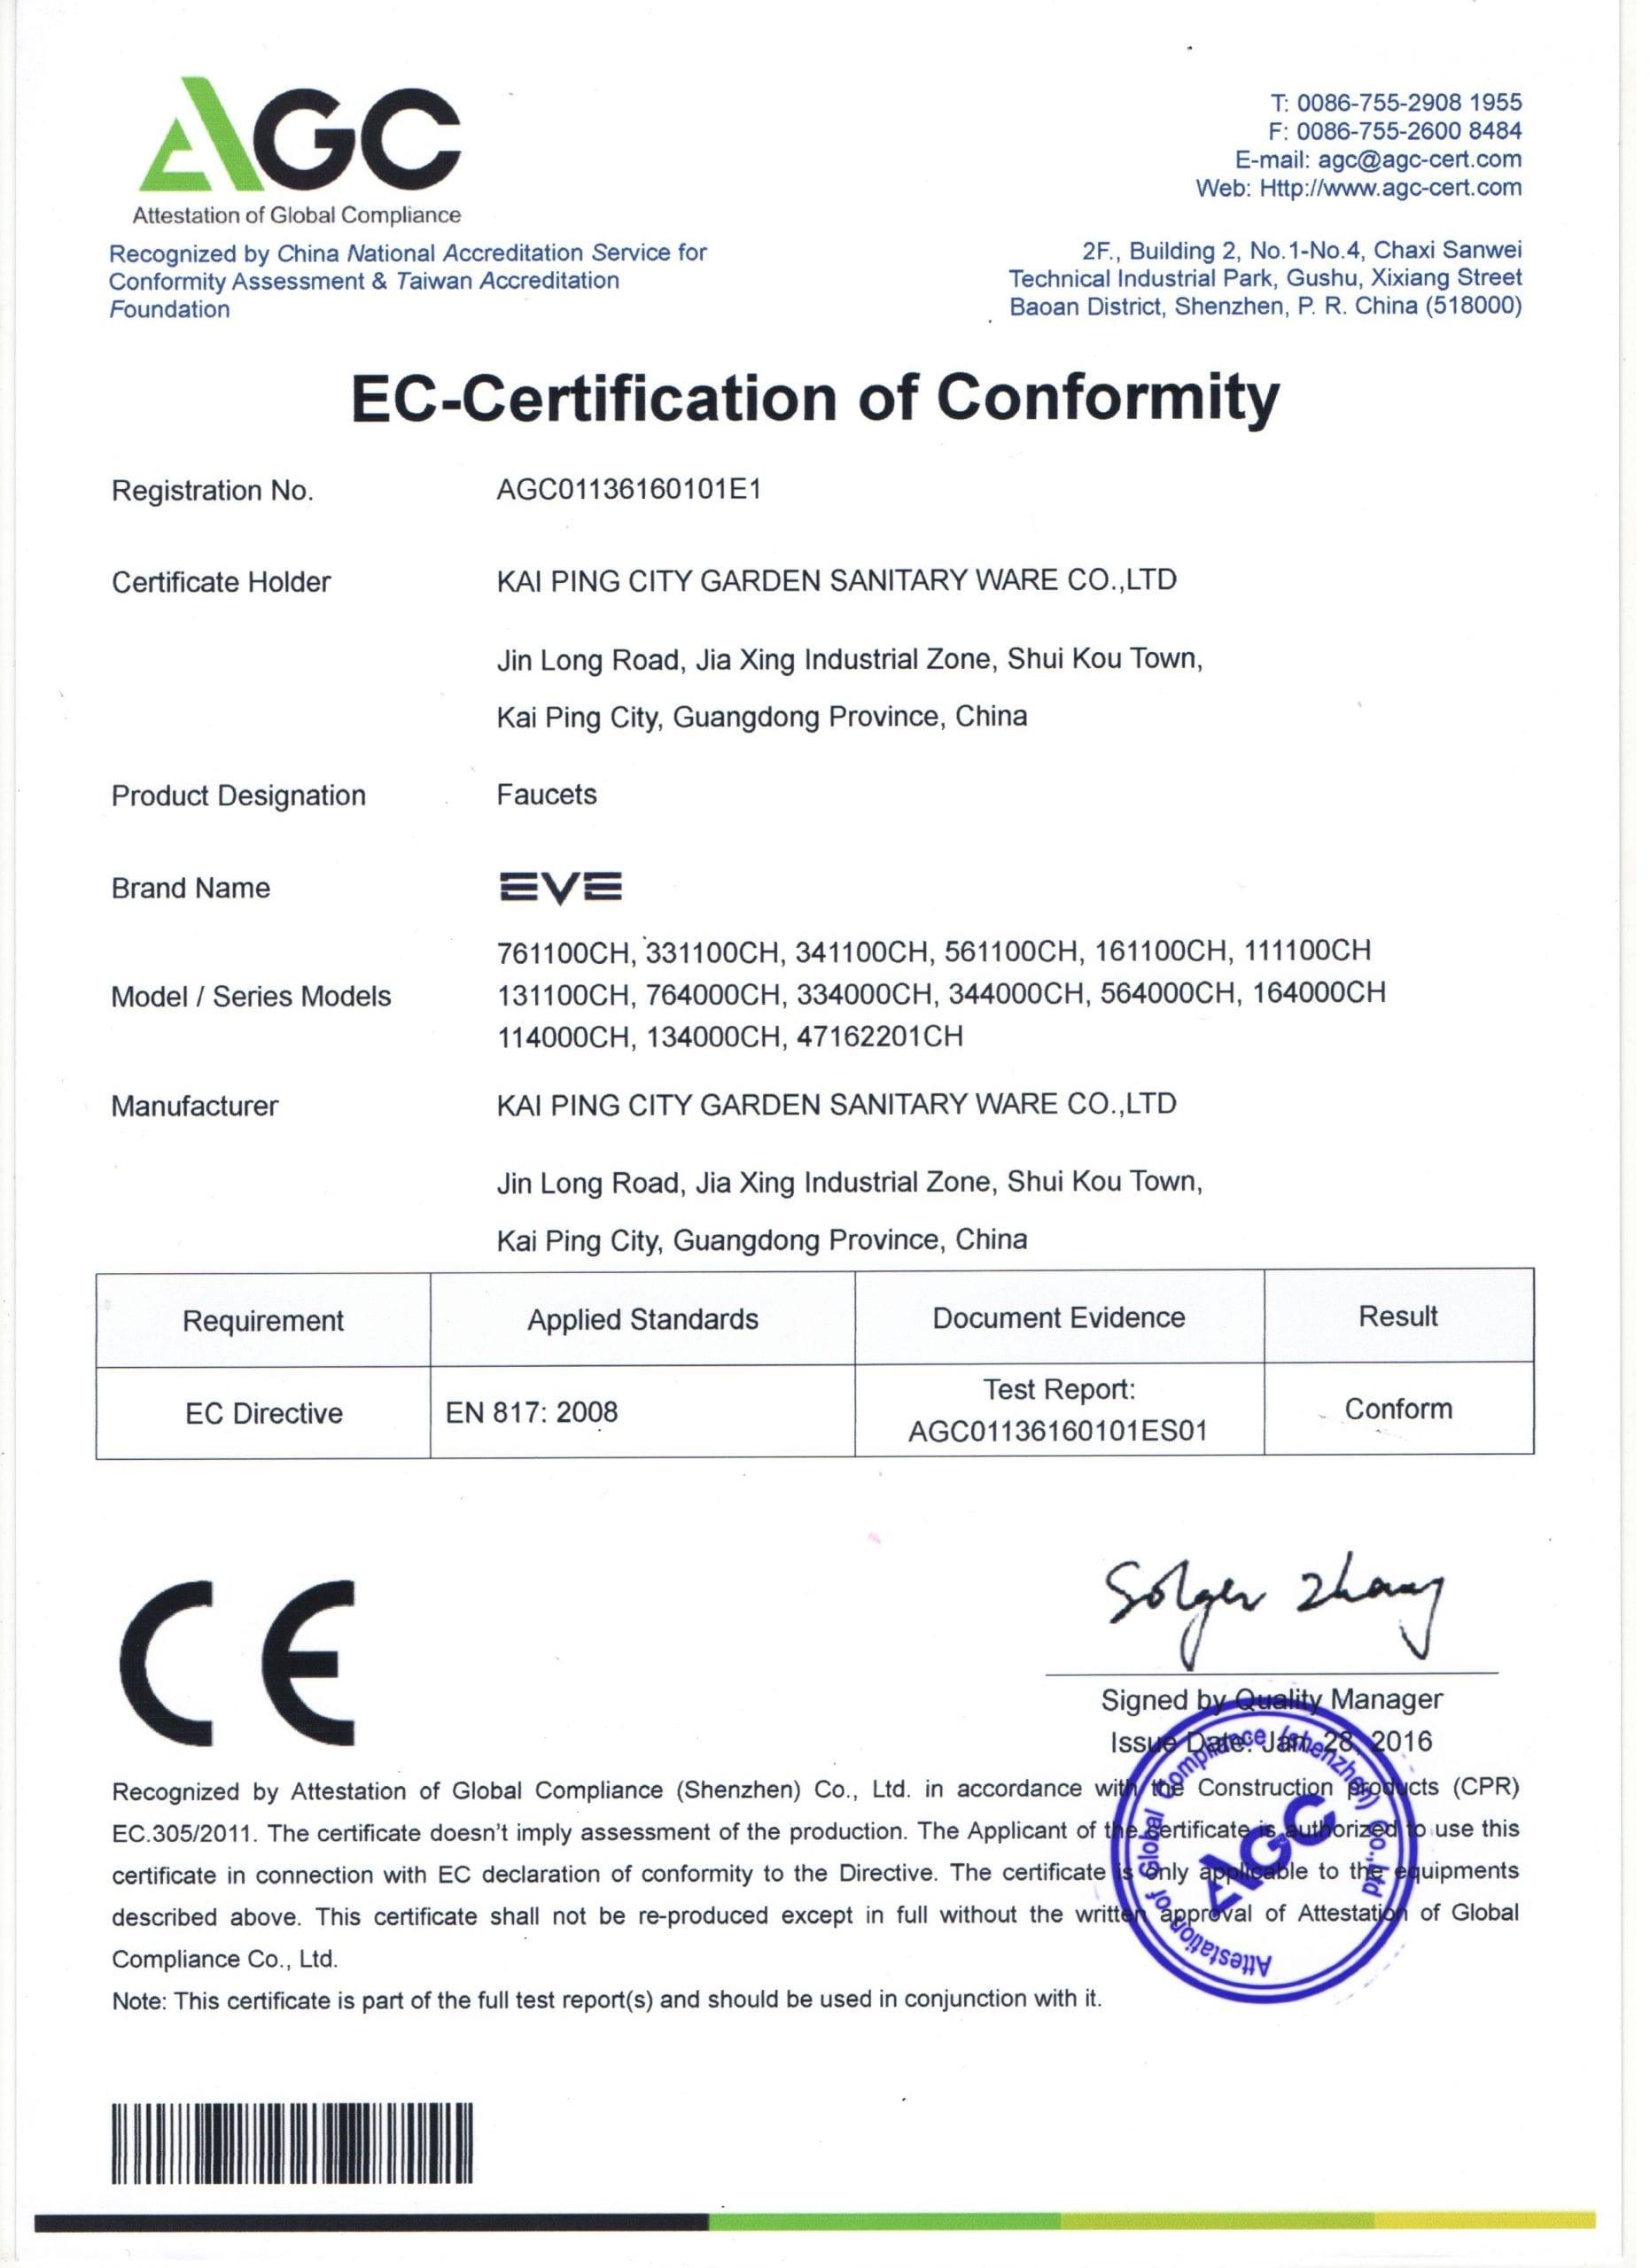 ce certificate vigafaucet factory faucet send manufacturer